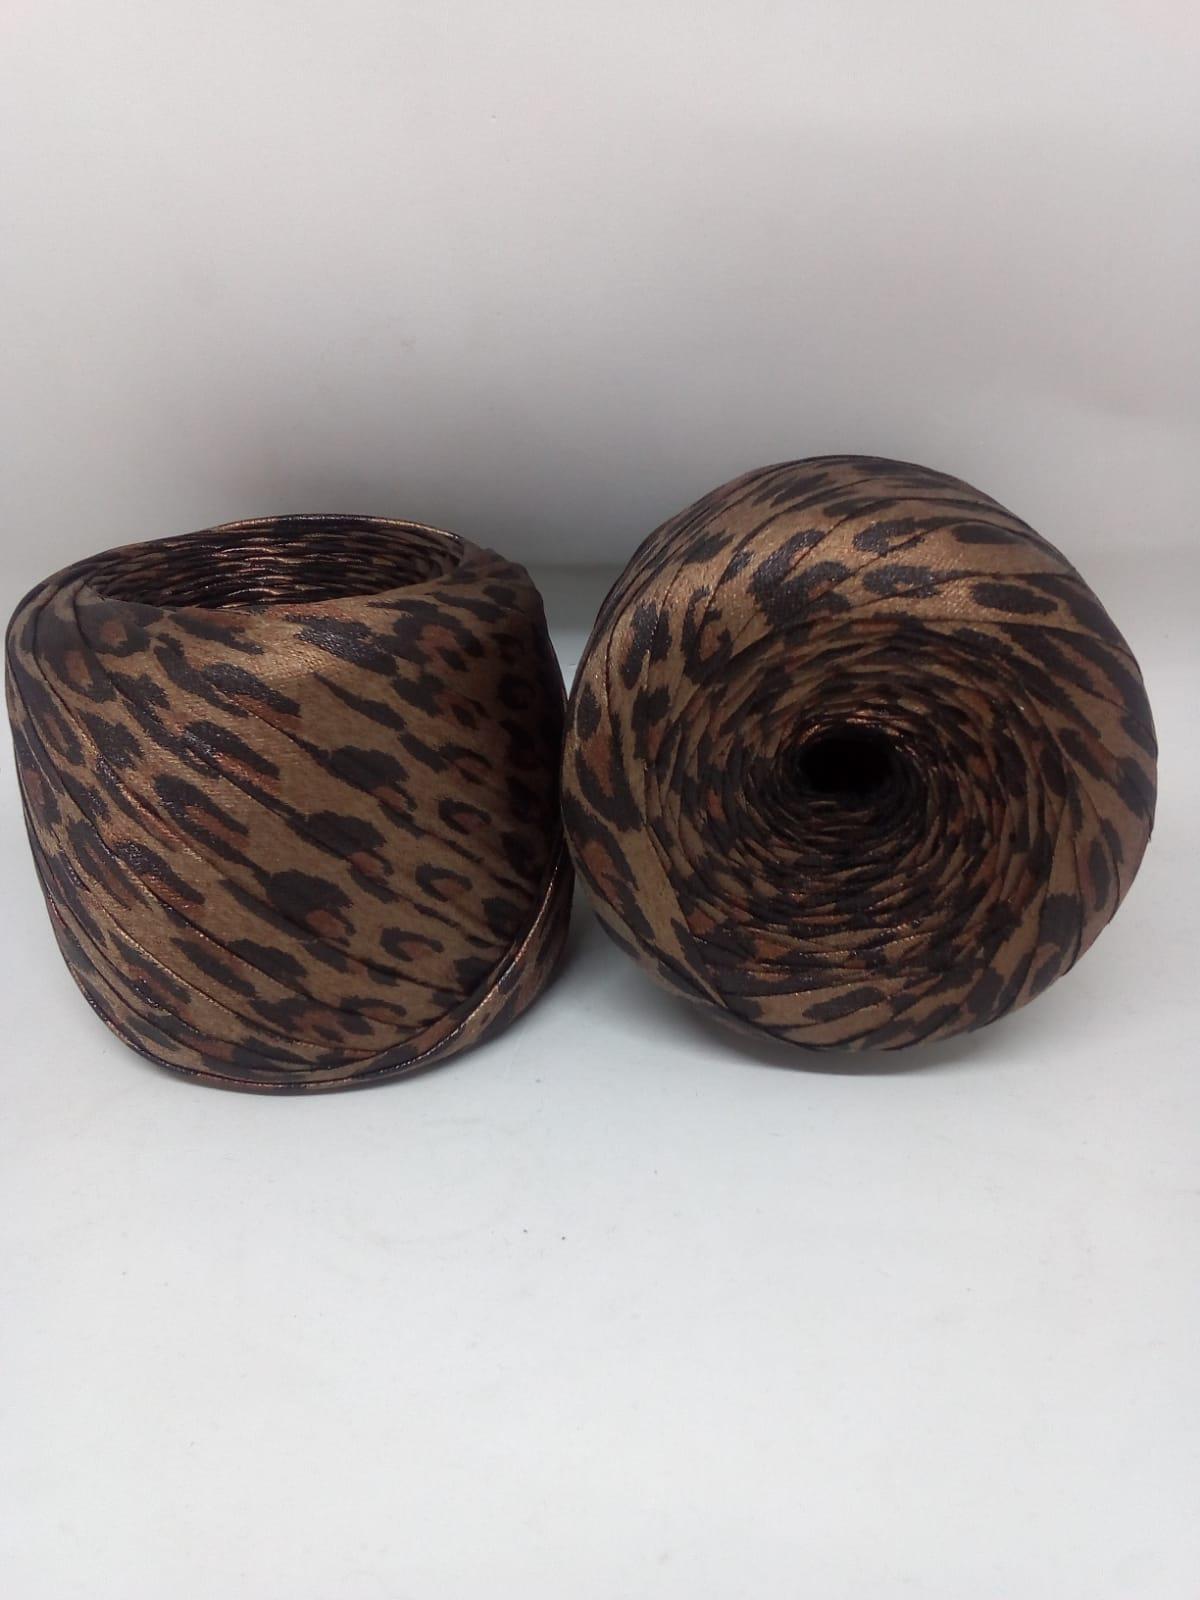 Maccaroni Metallic (Маккарони металика) 10 - леопард купить в Беларуси с доставкой